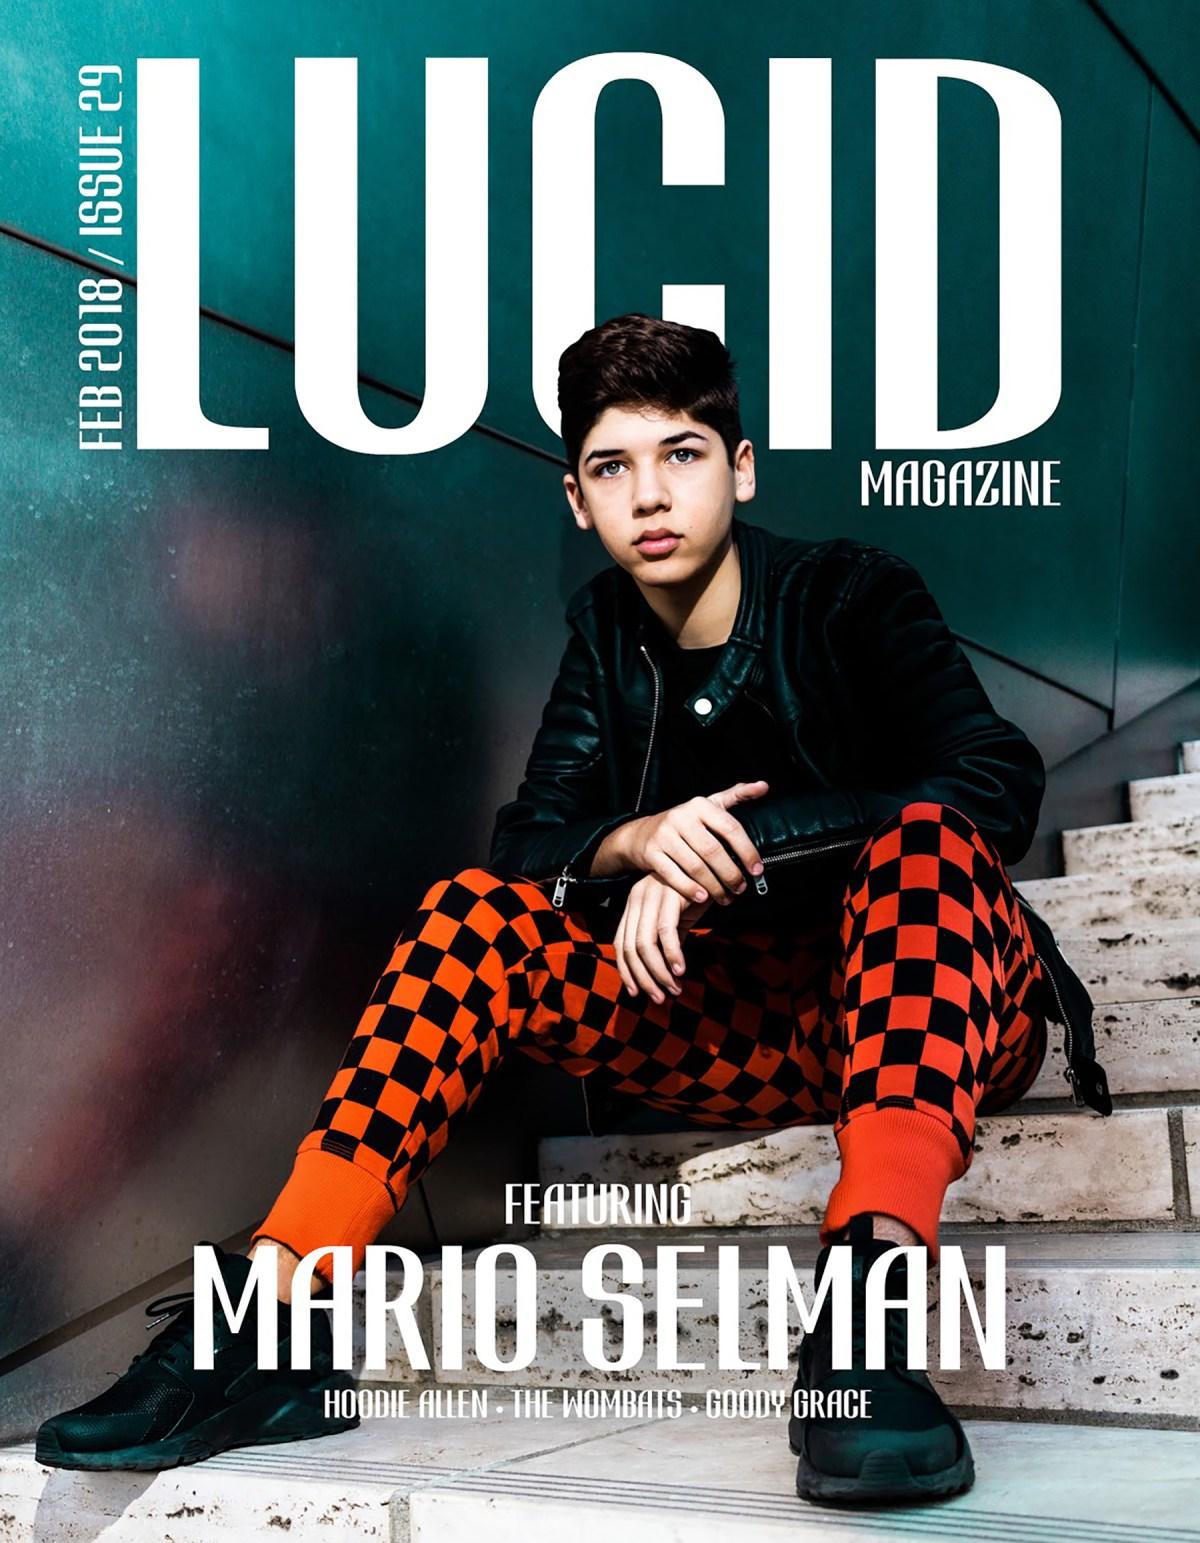 Mario Selman Lucid Magazine Jhanna Shaghaghi